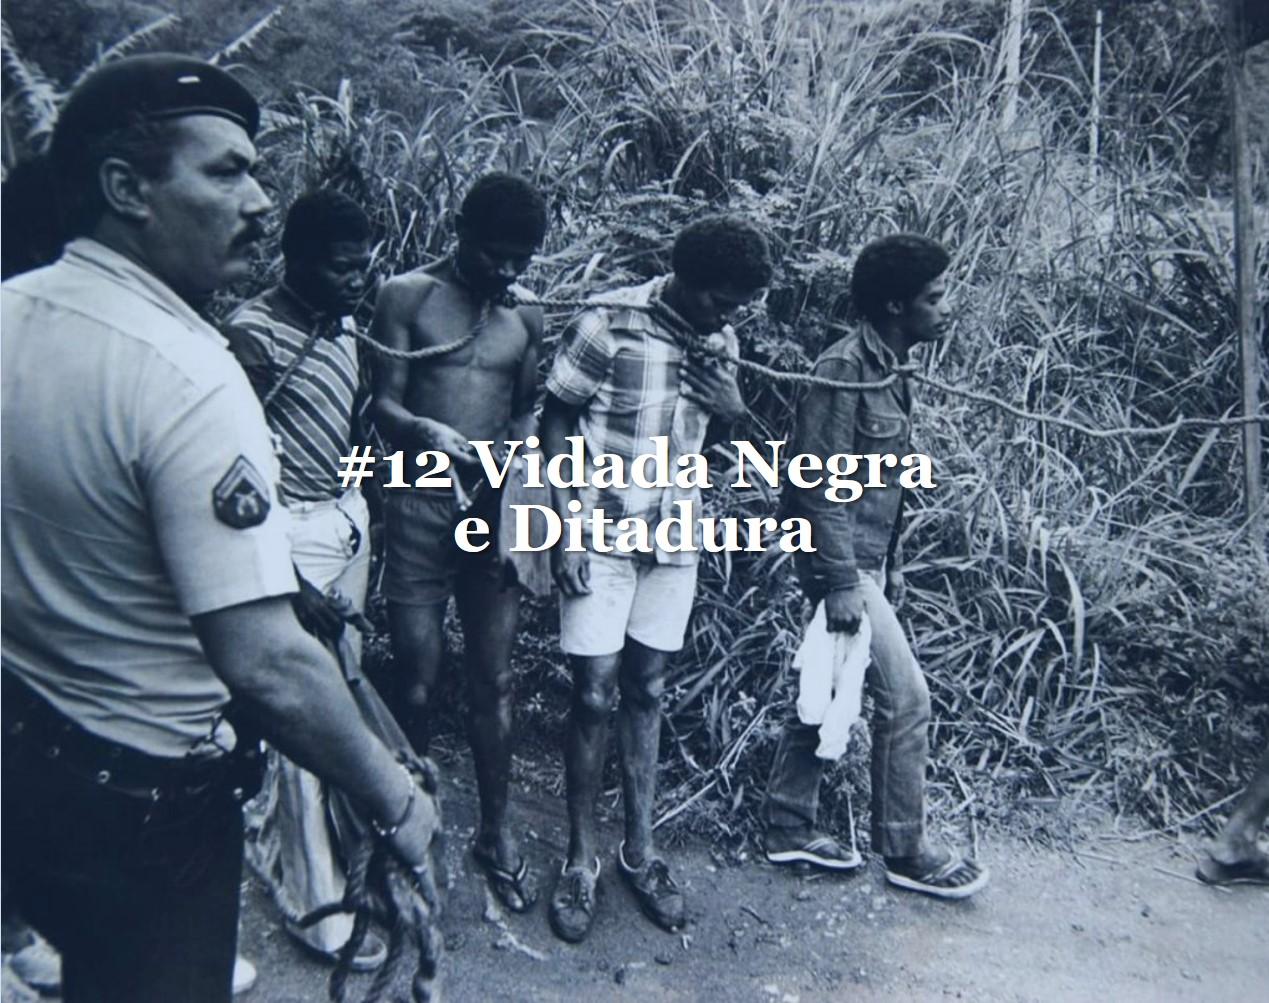 #12 Vida negra e ditadura wix